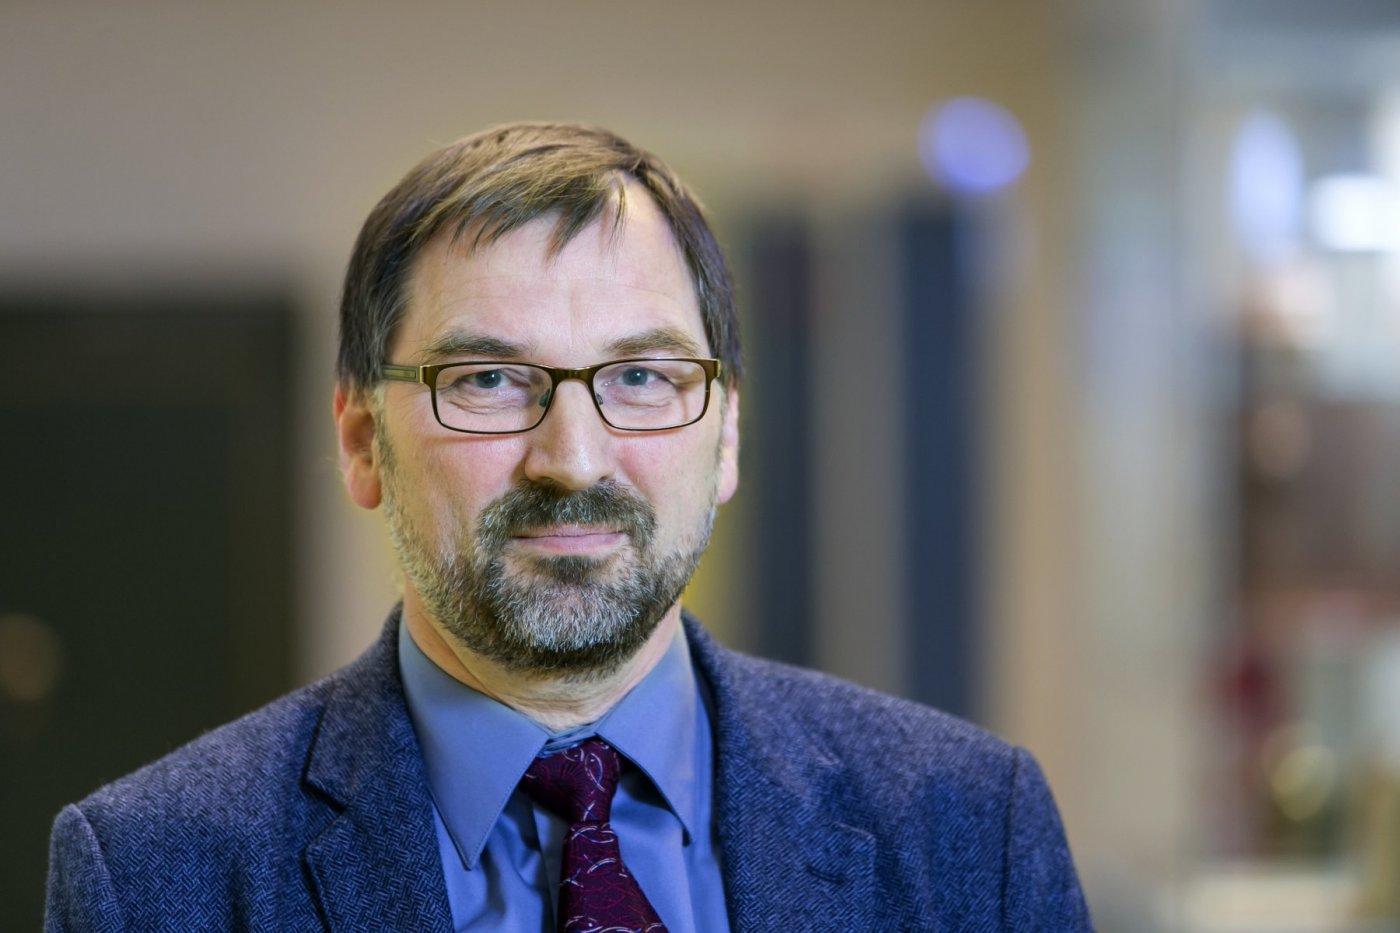 Professor Sveinbjörn Gizurarson